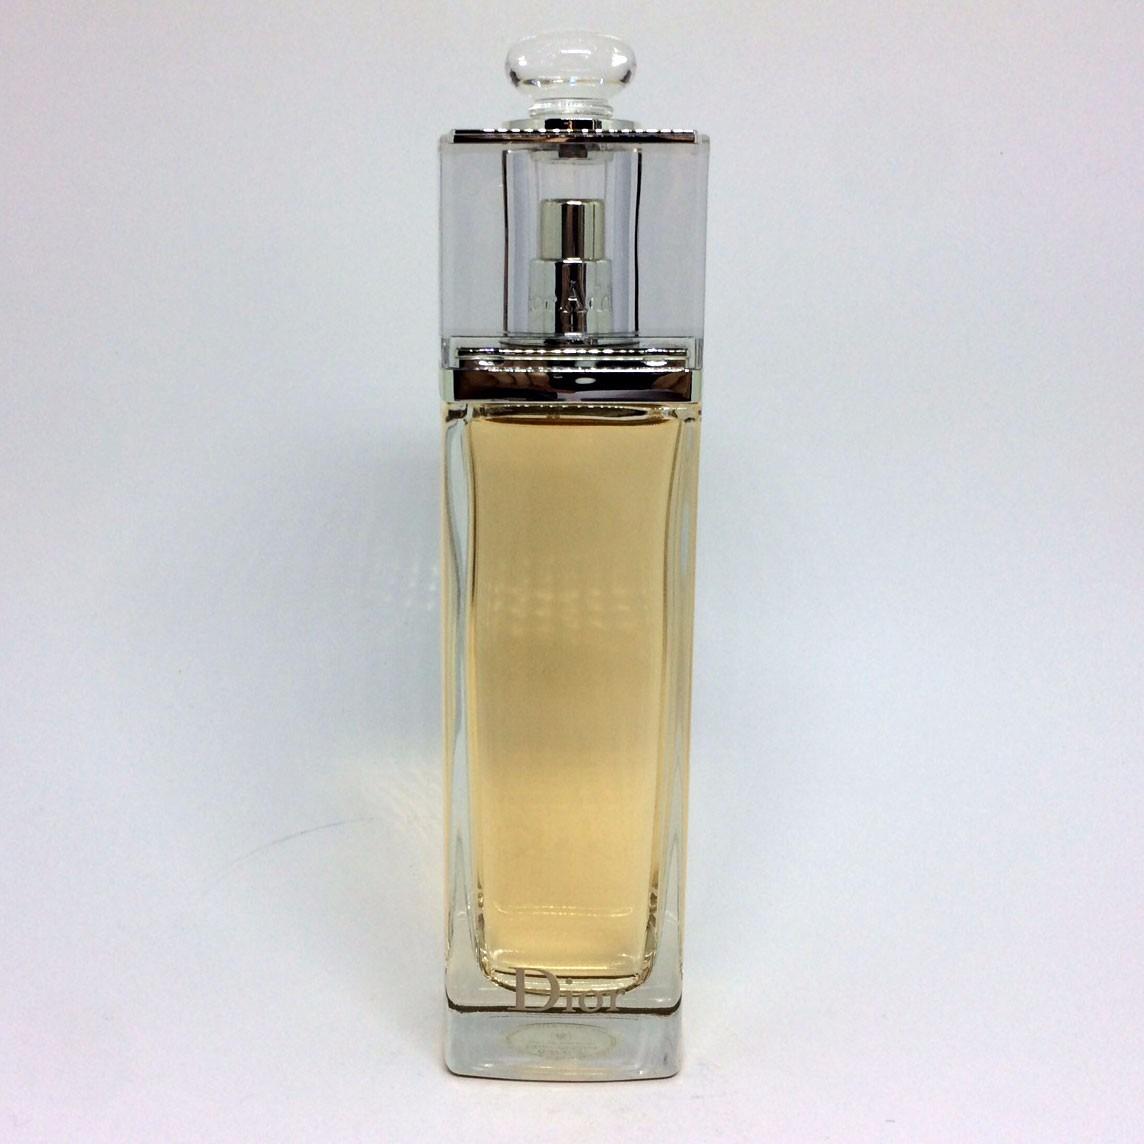 e477407ef9 perfume dior addict eau de toilette ( edt ) 100ml - feminino. Carregando  zoom... perfume dior feminino. Carregando zoom.